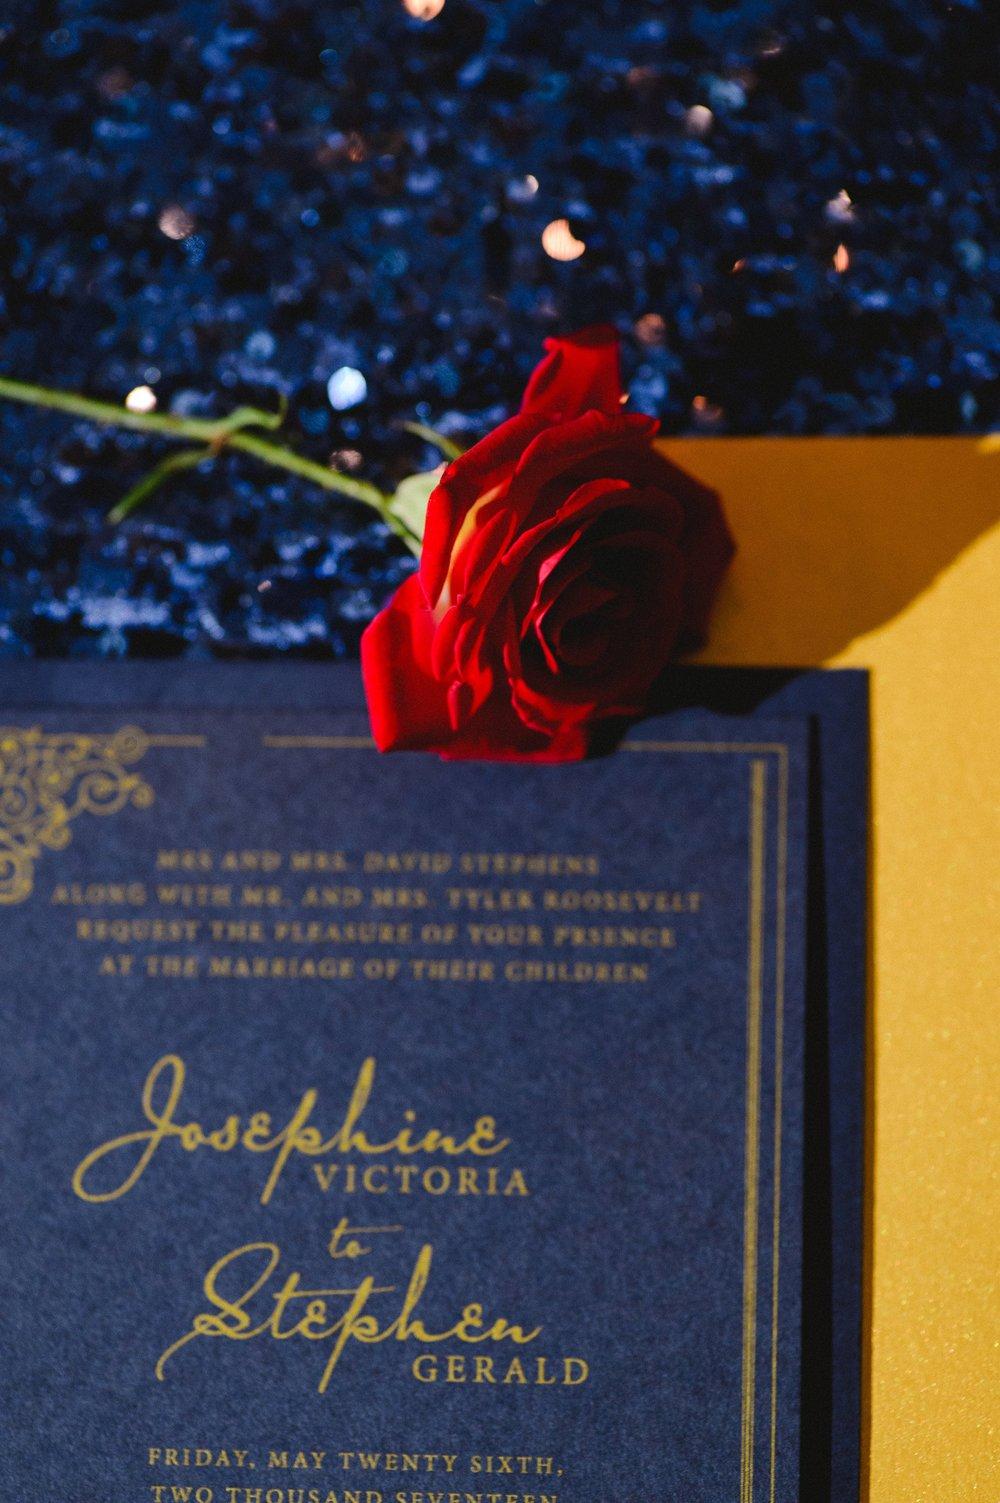 KatherineMurrayPhotography_StyledShoot_Wedding_BeautyAndTheBeast_ATaleAsOldAsTime_theAllure_LaPorteIndiana00249-min.jpg